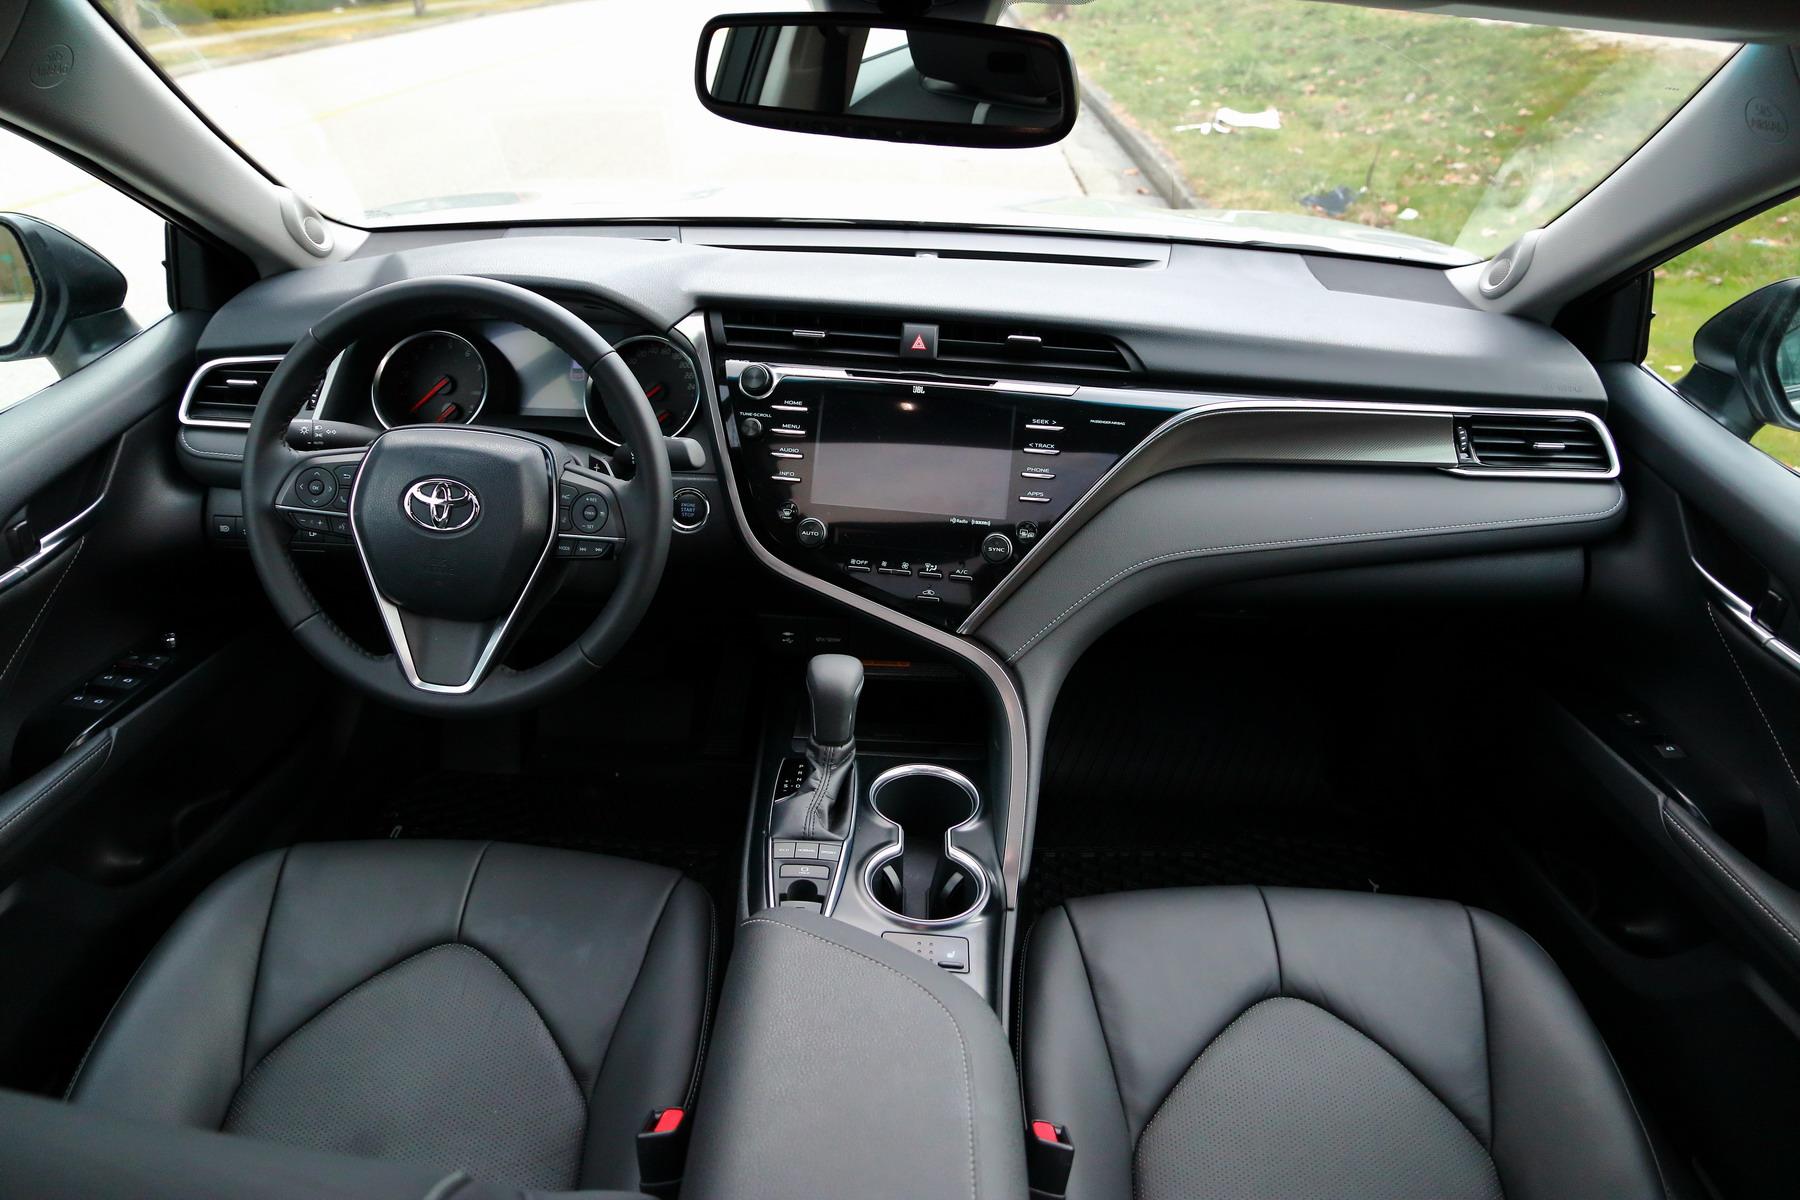 Toyota Camry Xse 2018 >> 車評:變身轎跑 2018 Toyota Camry XSE | 大紀元